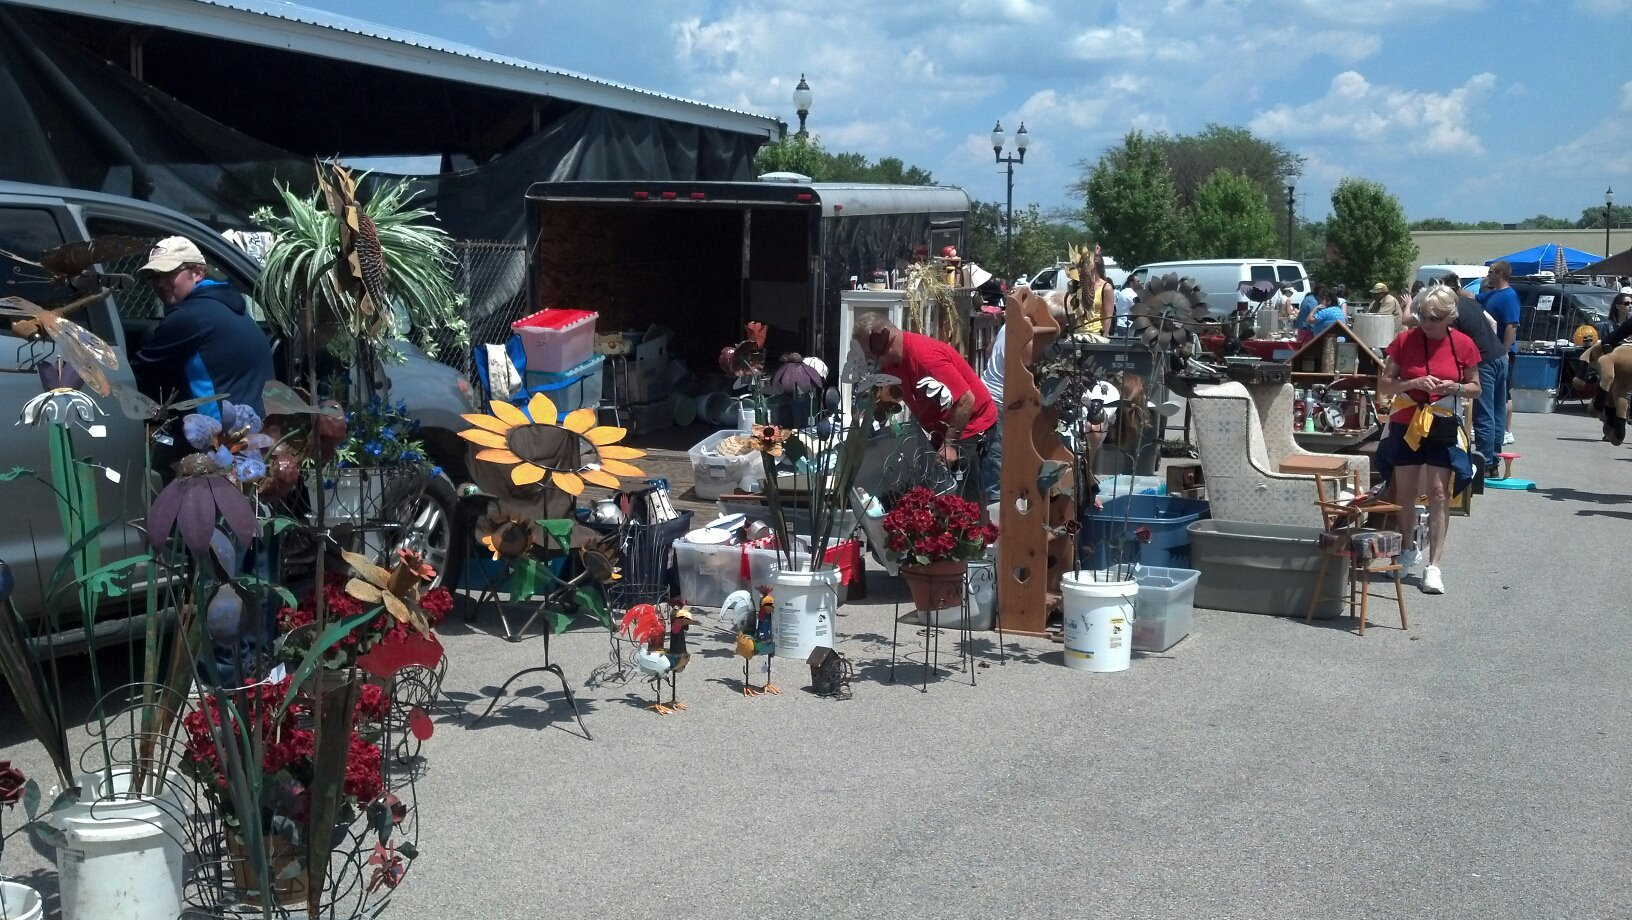 Kane County Flea Market